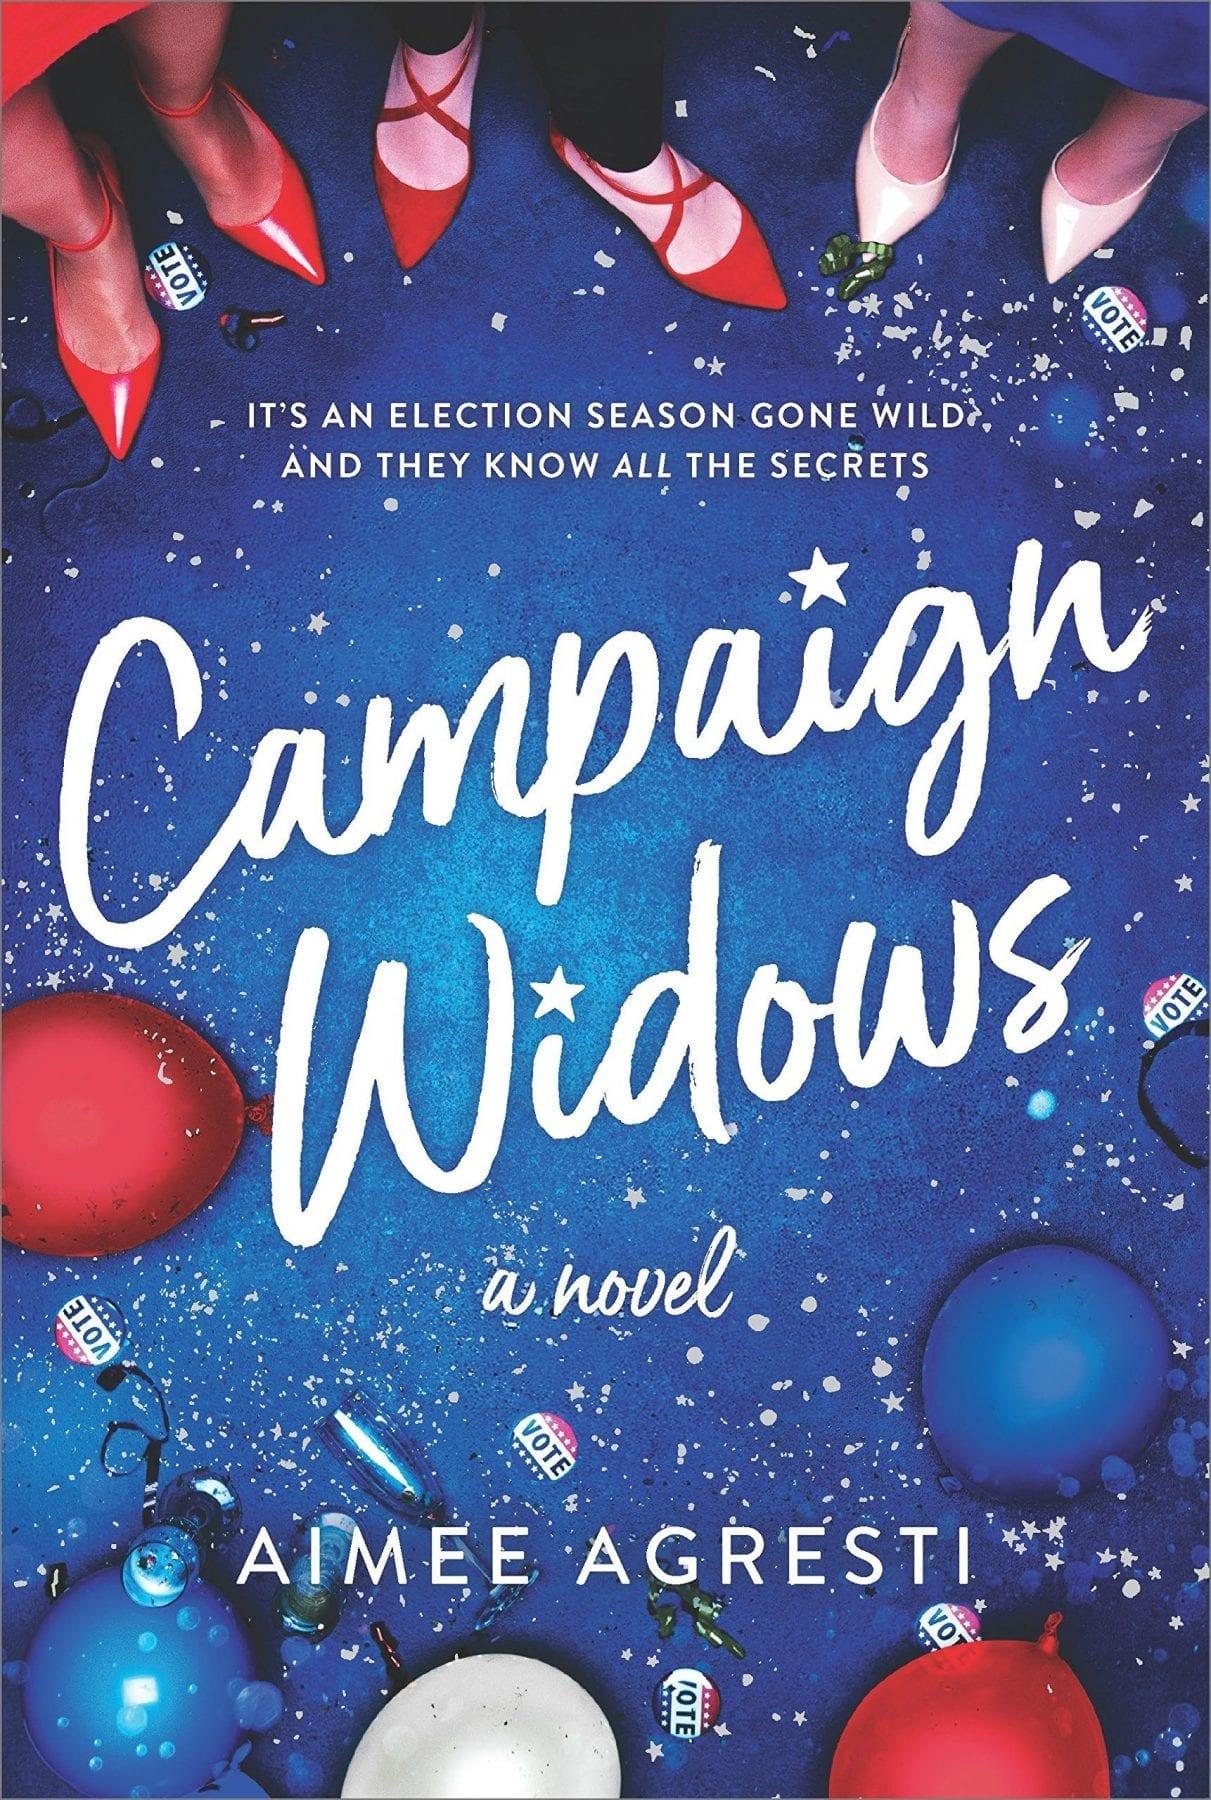 Campaign Widows by Aimee Agresti